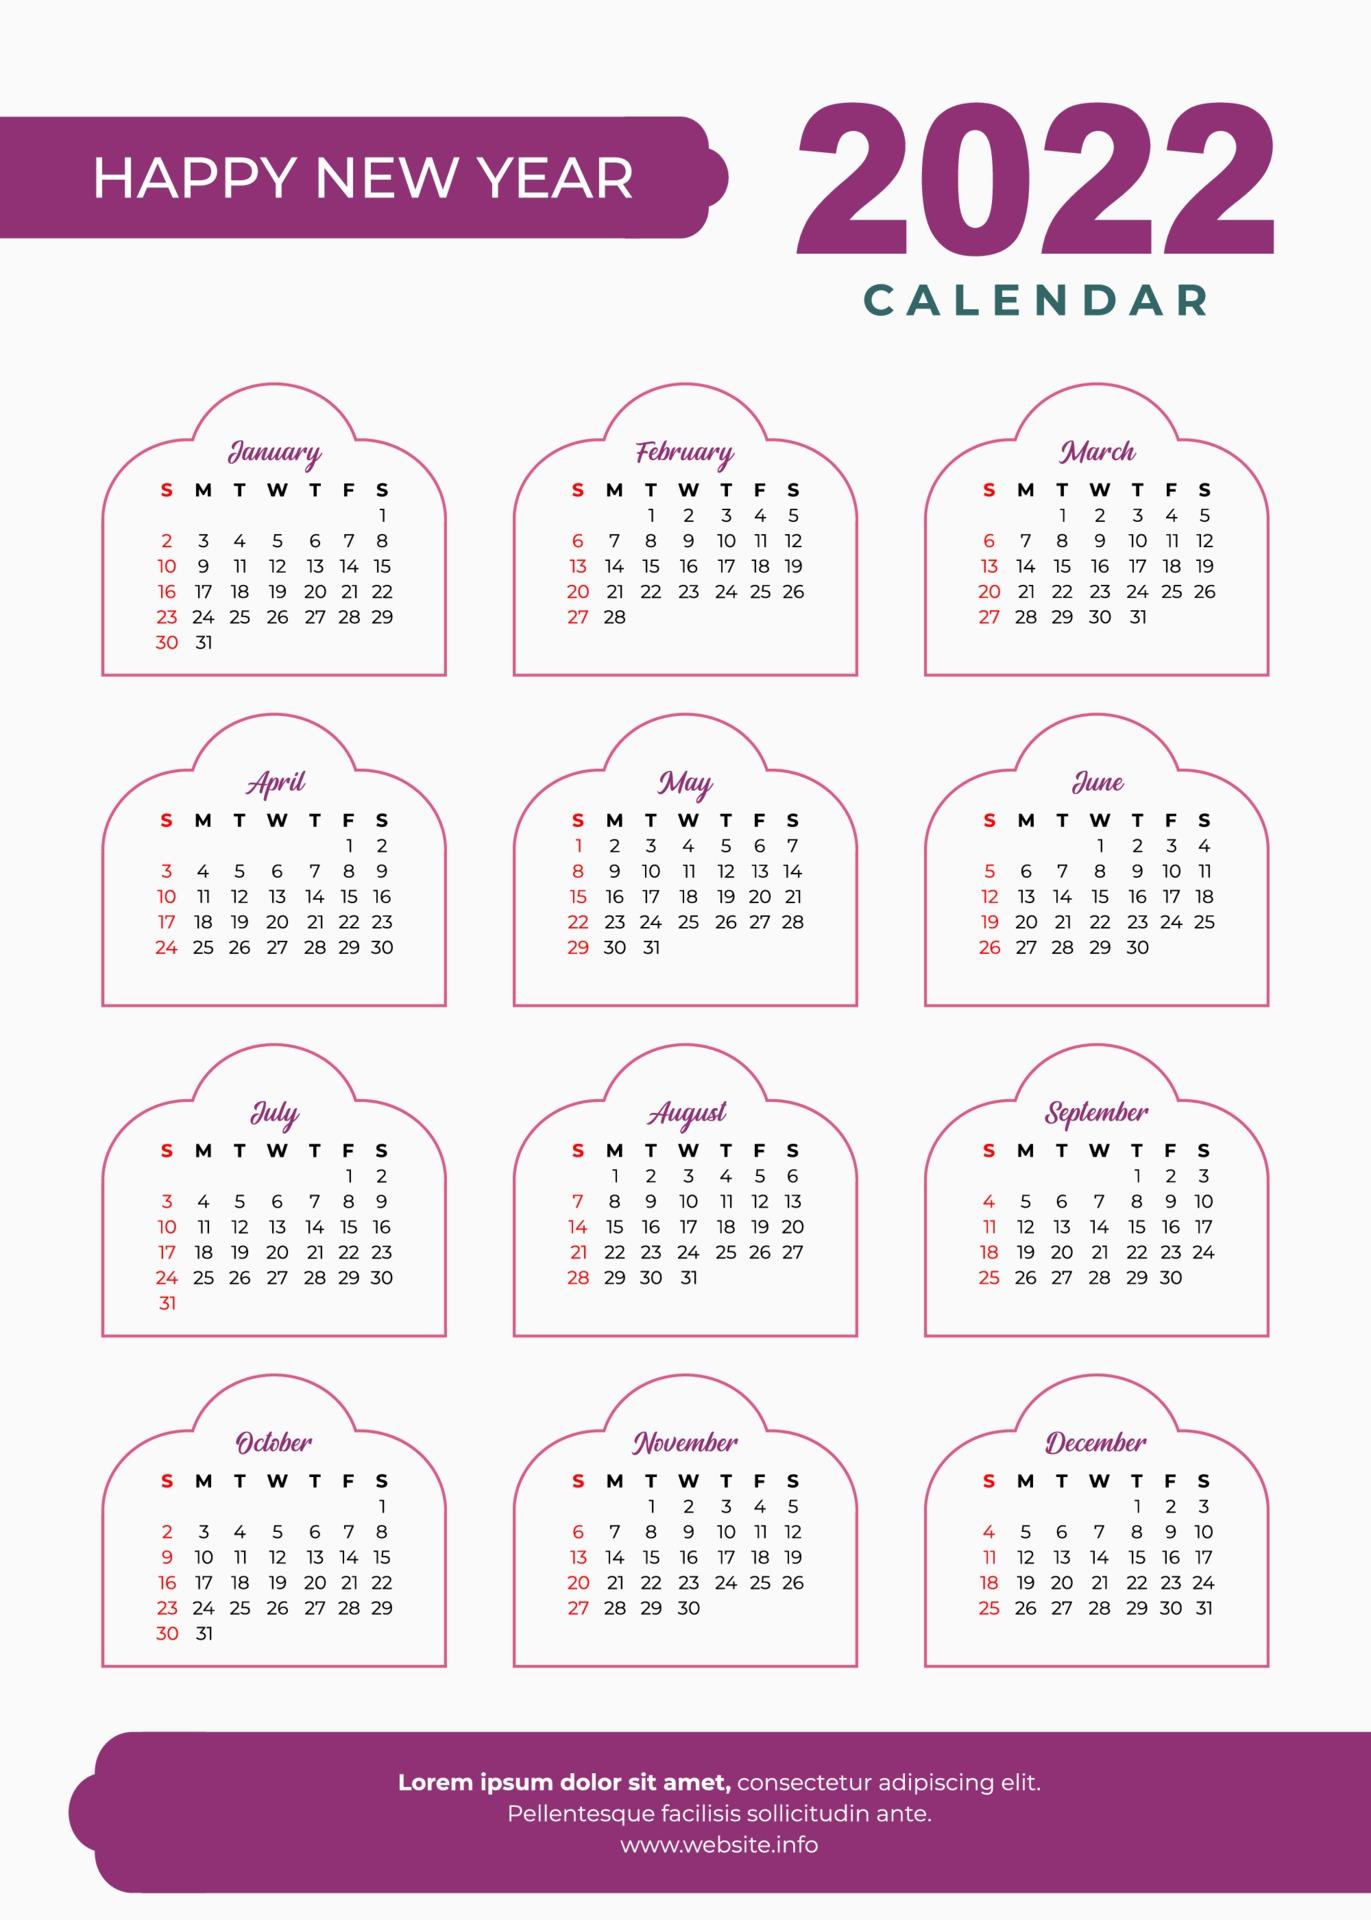 Arabic Calendar 2022.2022 Islamic Calendar Design 2198761 Vector Art At Vecteezy